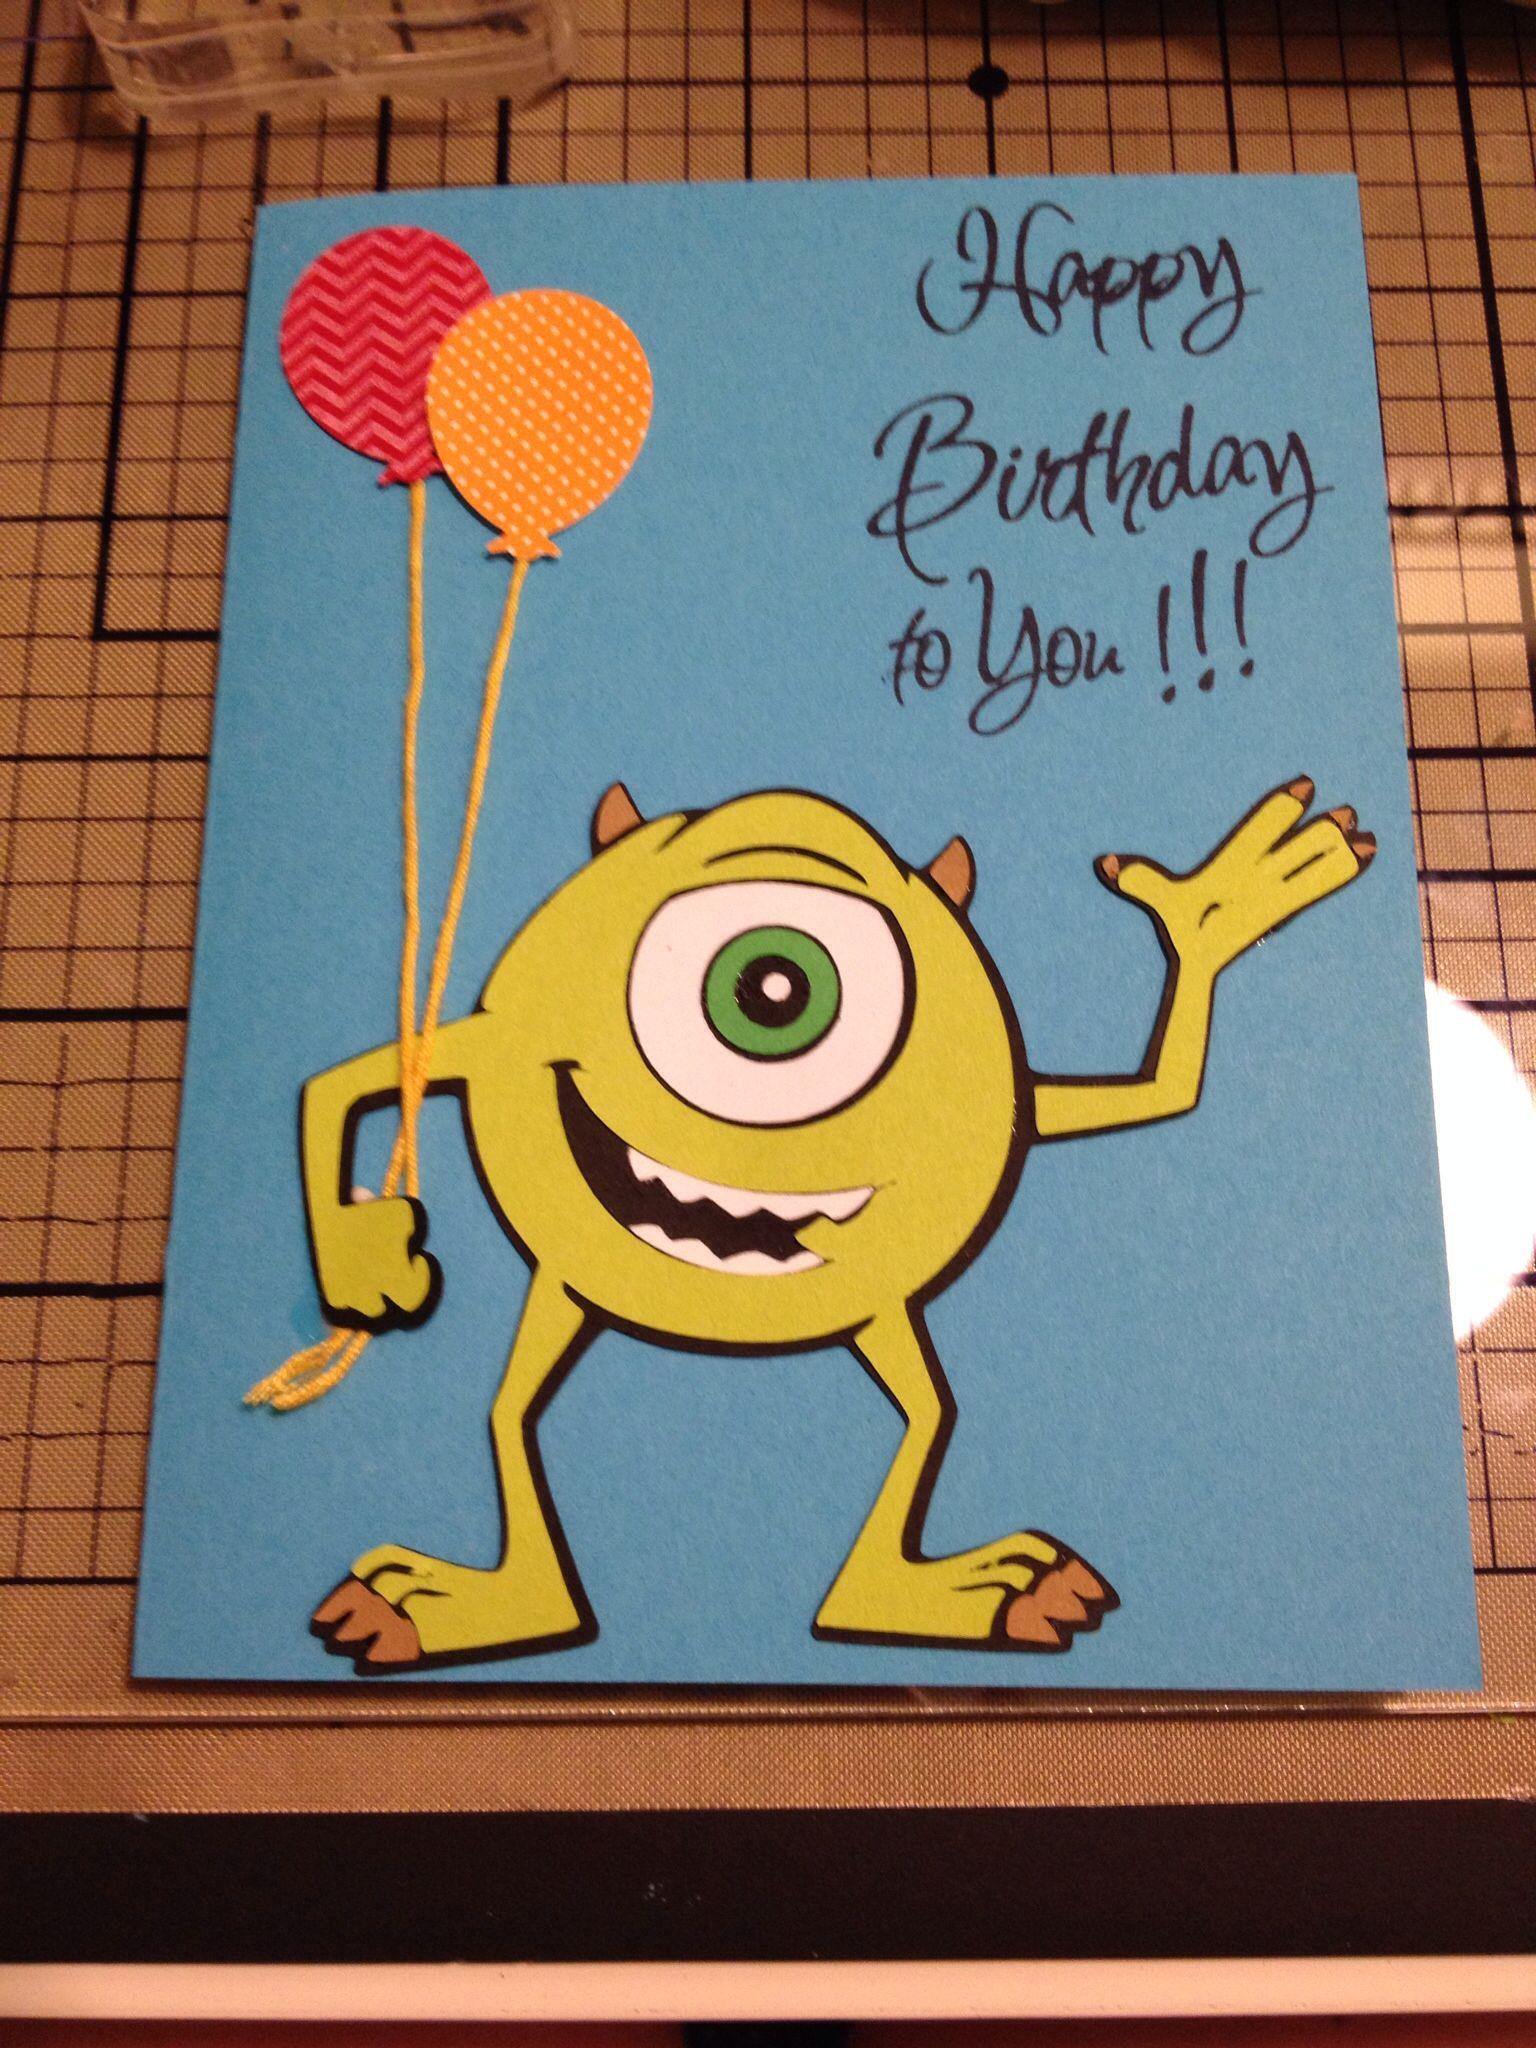 Monsters Inc Birthday Card Cricut Best Of Pixar Kids Birthday Cards Disney Cards Birthday Cards For Boys